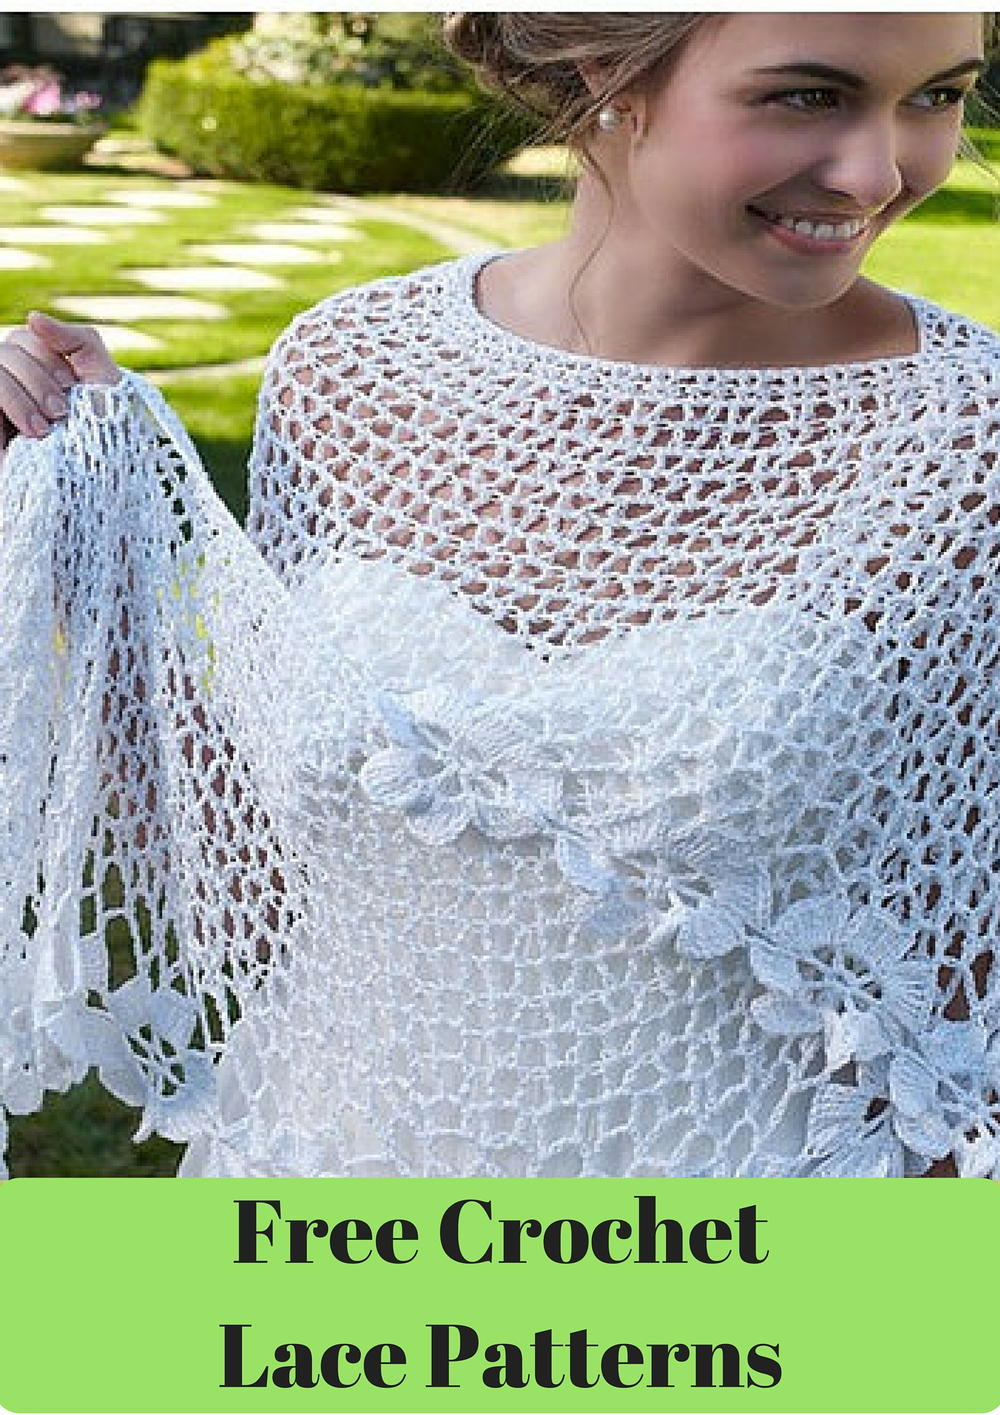 Free Crochet Patterns Online : 30 Free Crochet Lace Patterns AllFreeCrochet.com